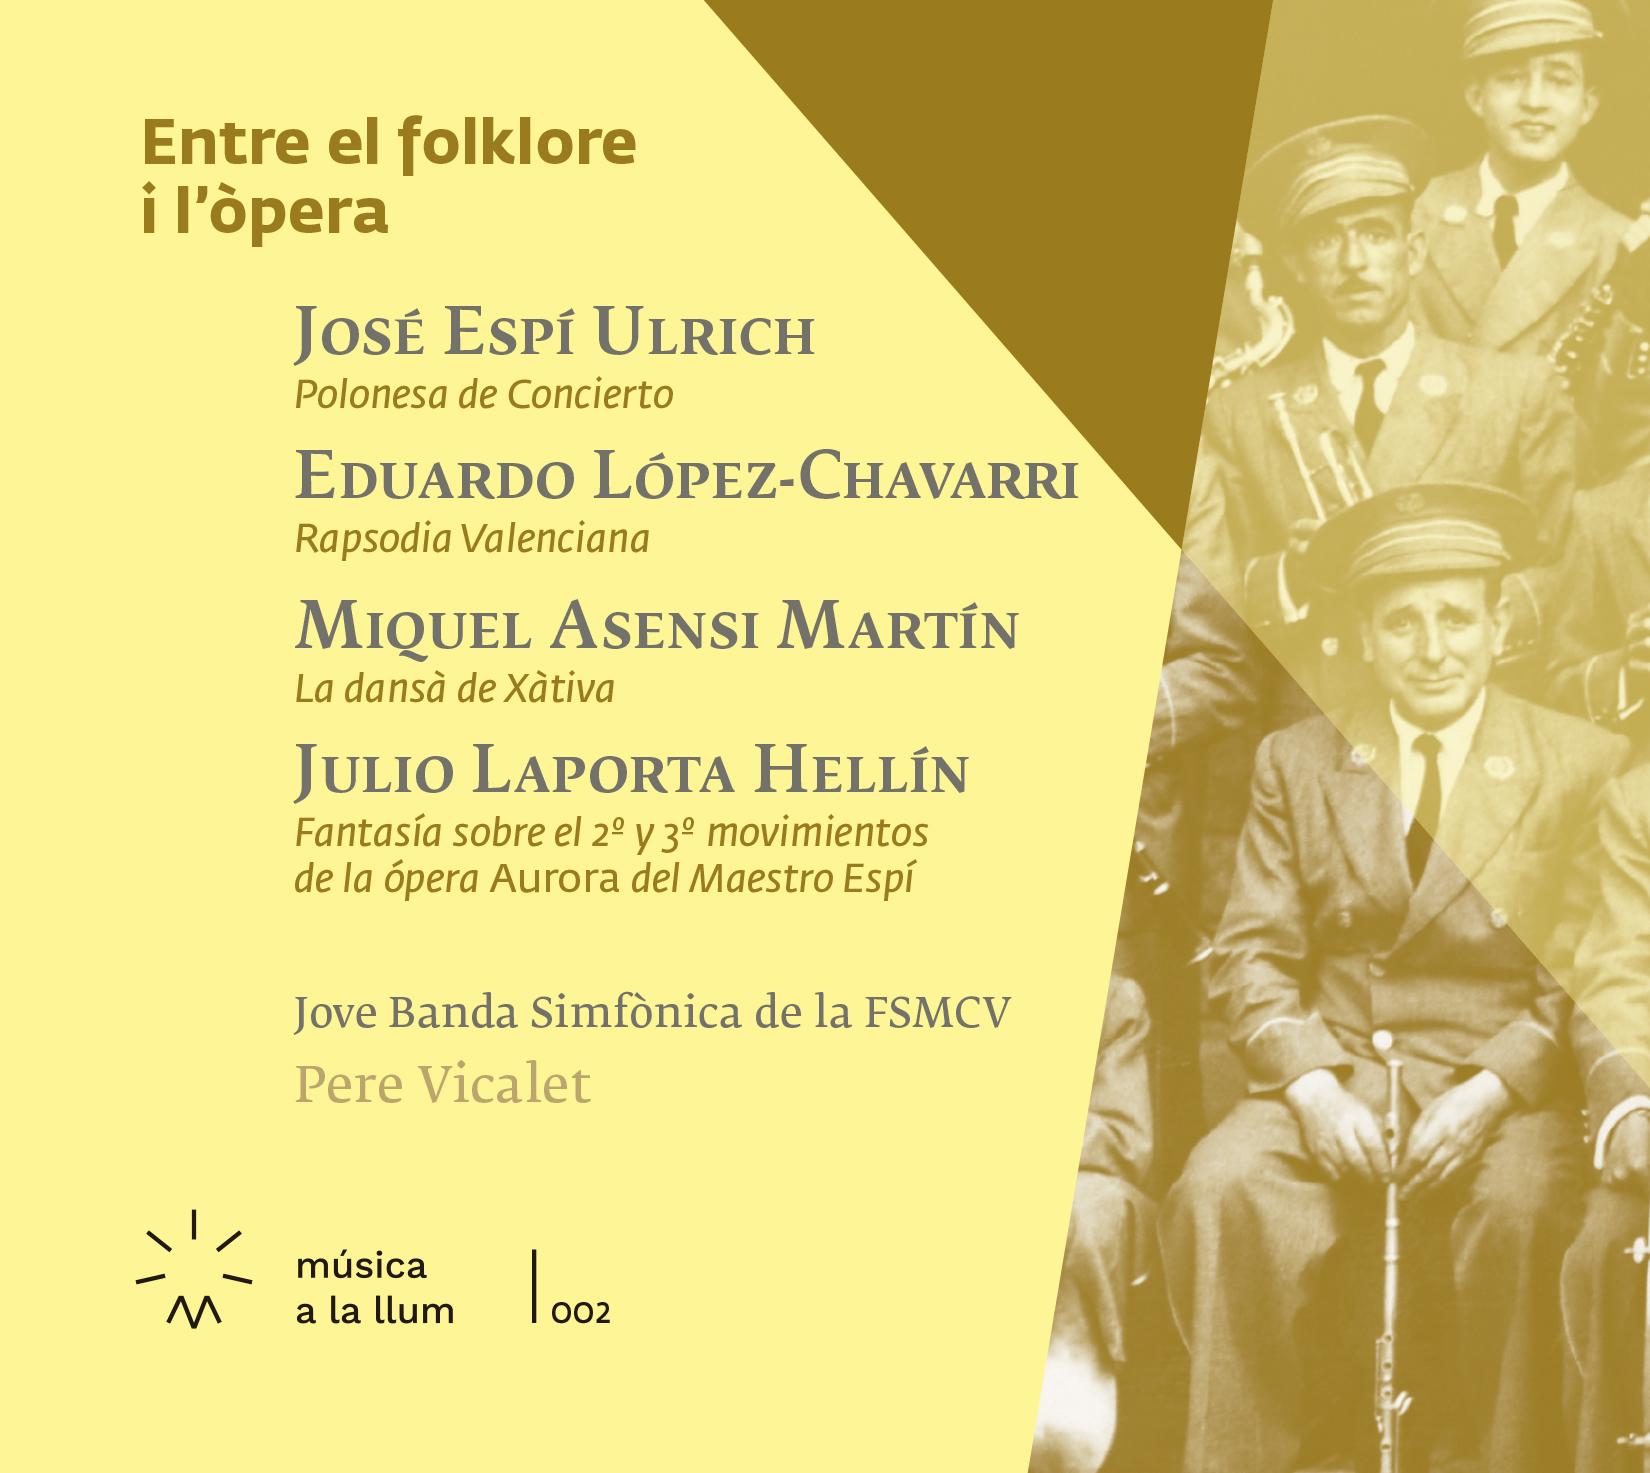 002 cd musicaalallum entre folklore opera 002